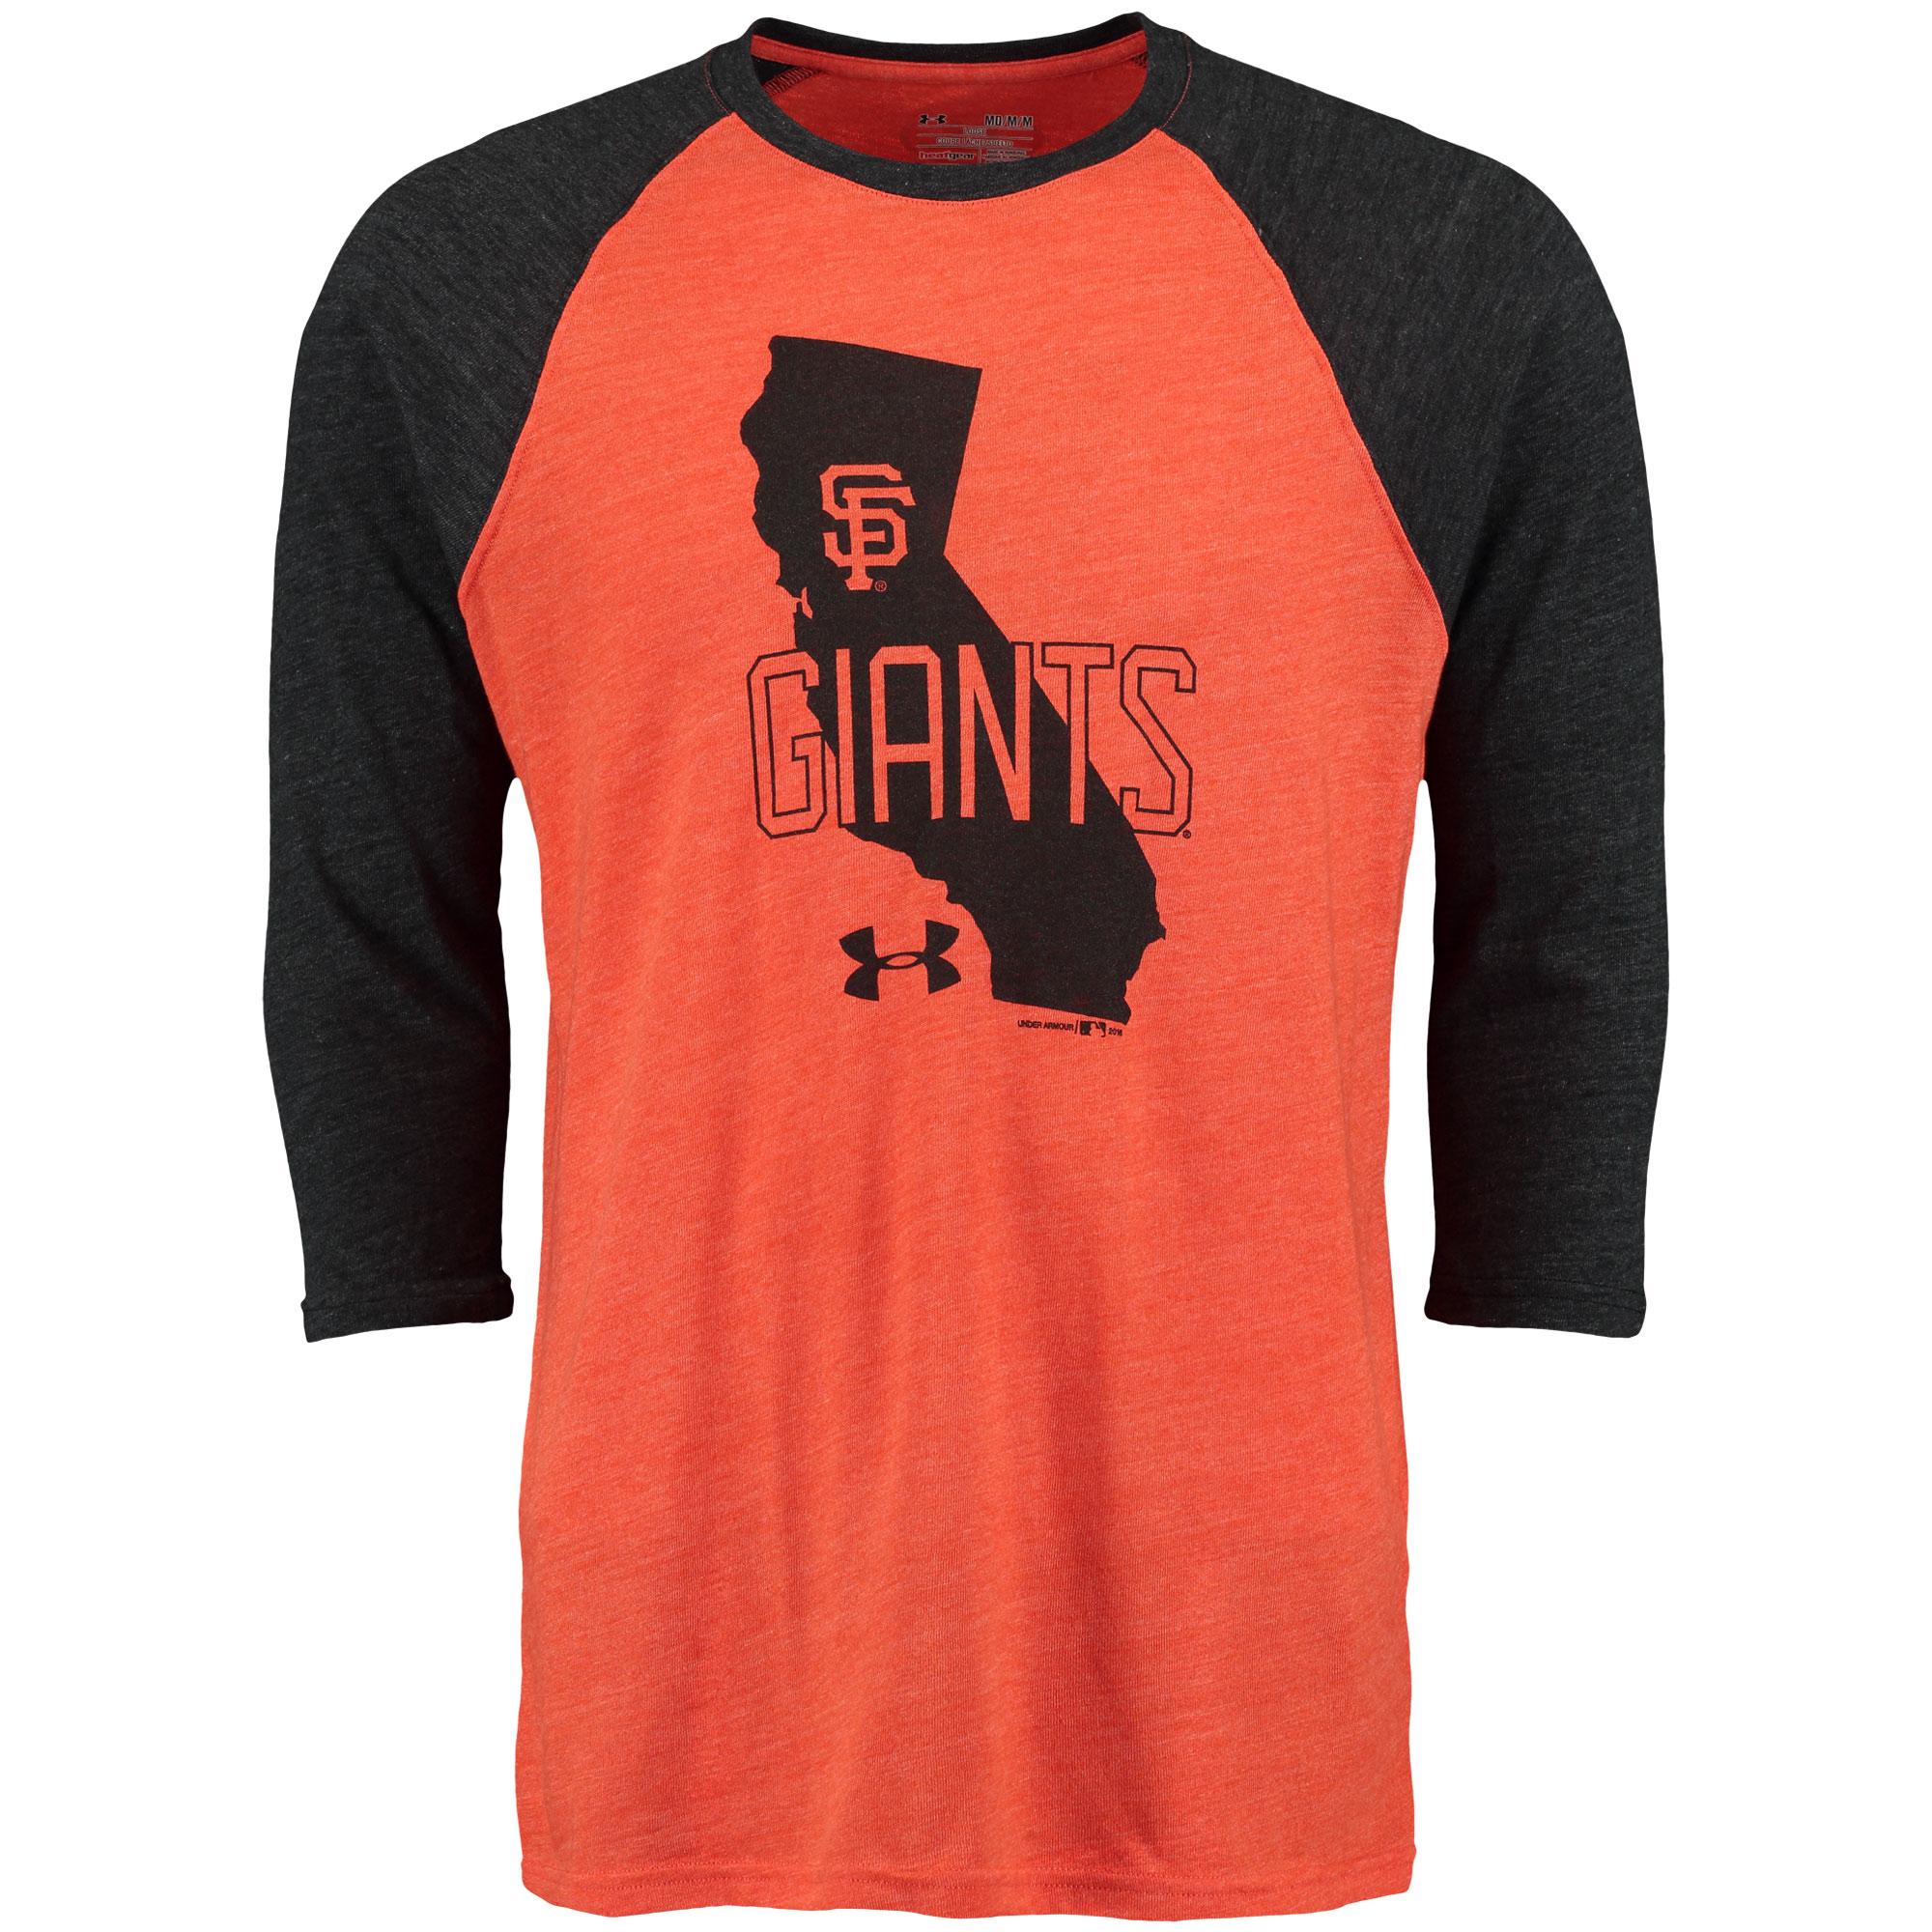 San Francisco Giants Under Armour 3/4-Sleeve Tri-Blend Baseball Performance T-Shirt - Orange/Black